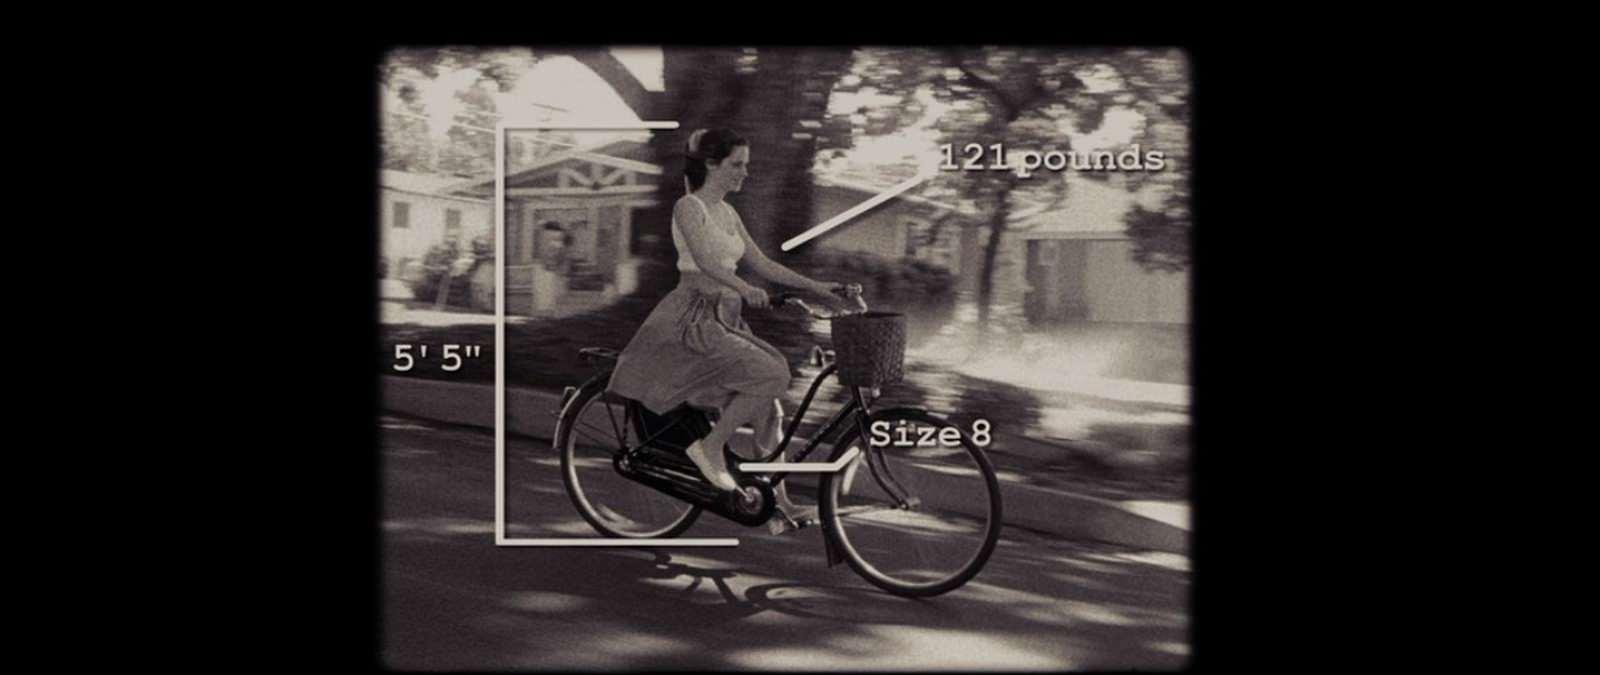 Movie, Days of Summer(美國) / 戀夏500日(台) / 心跳500天(港) / 和莎莫的500天(網), 電影劇照